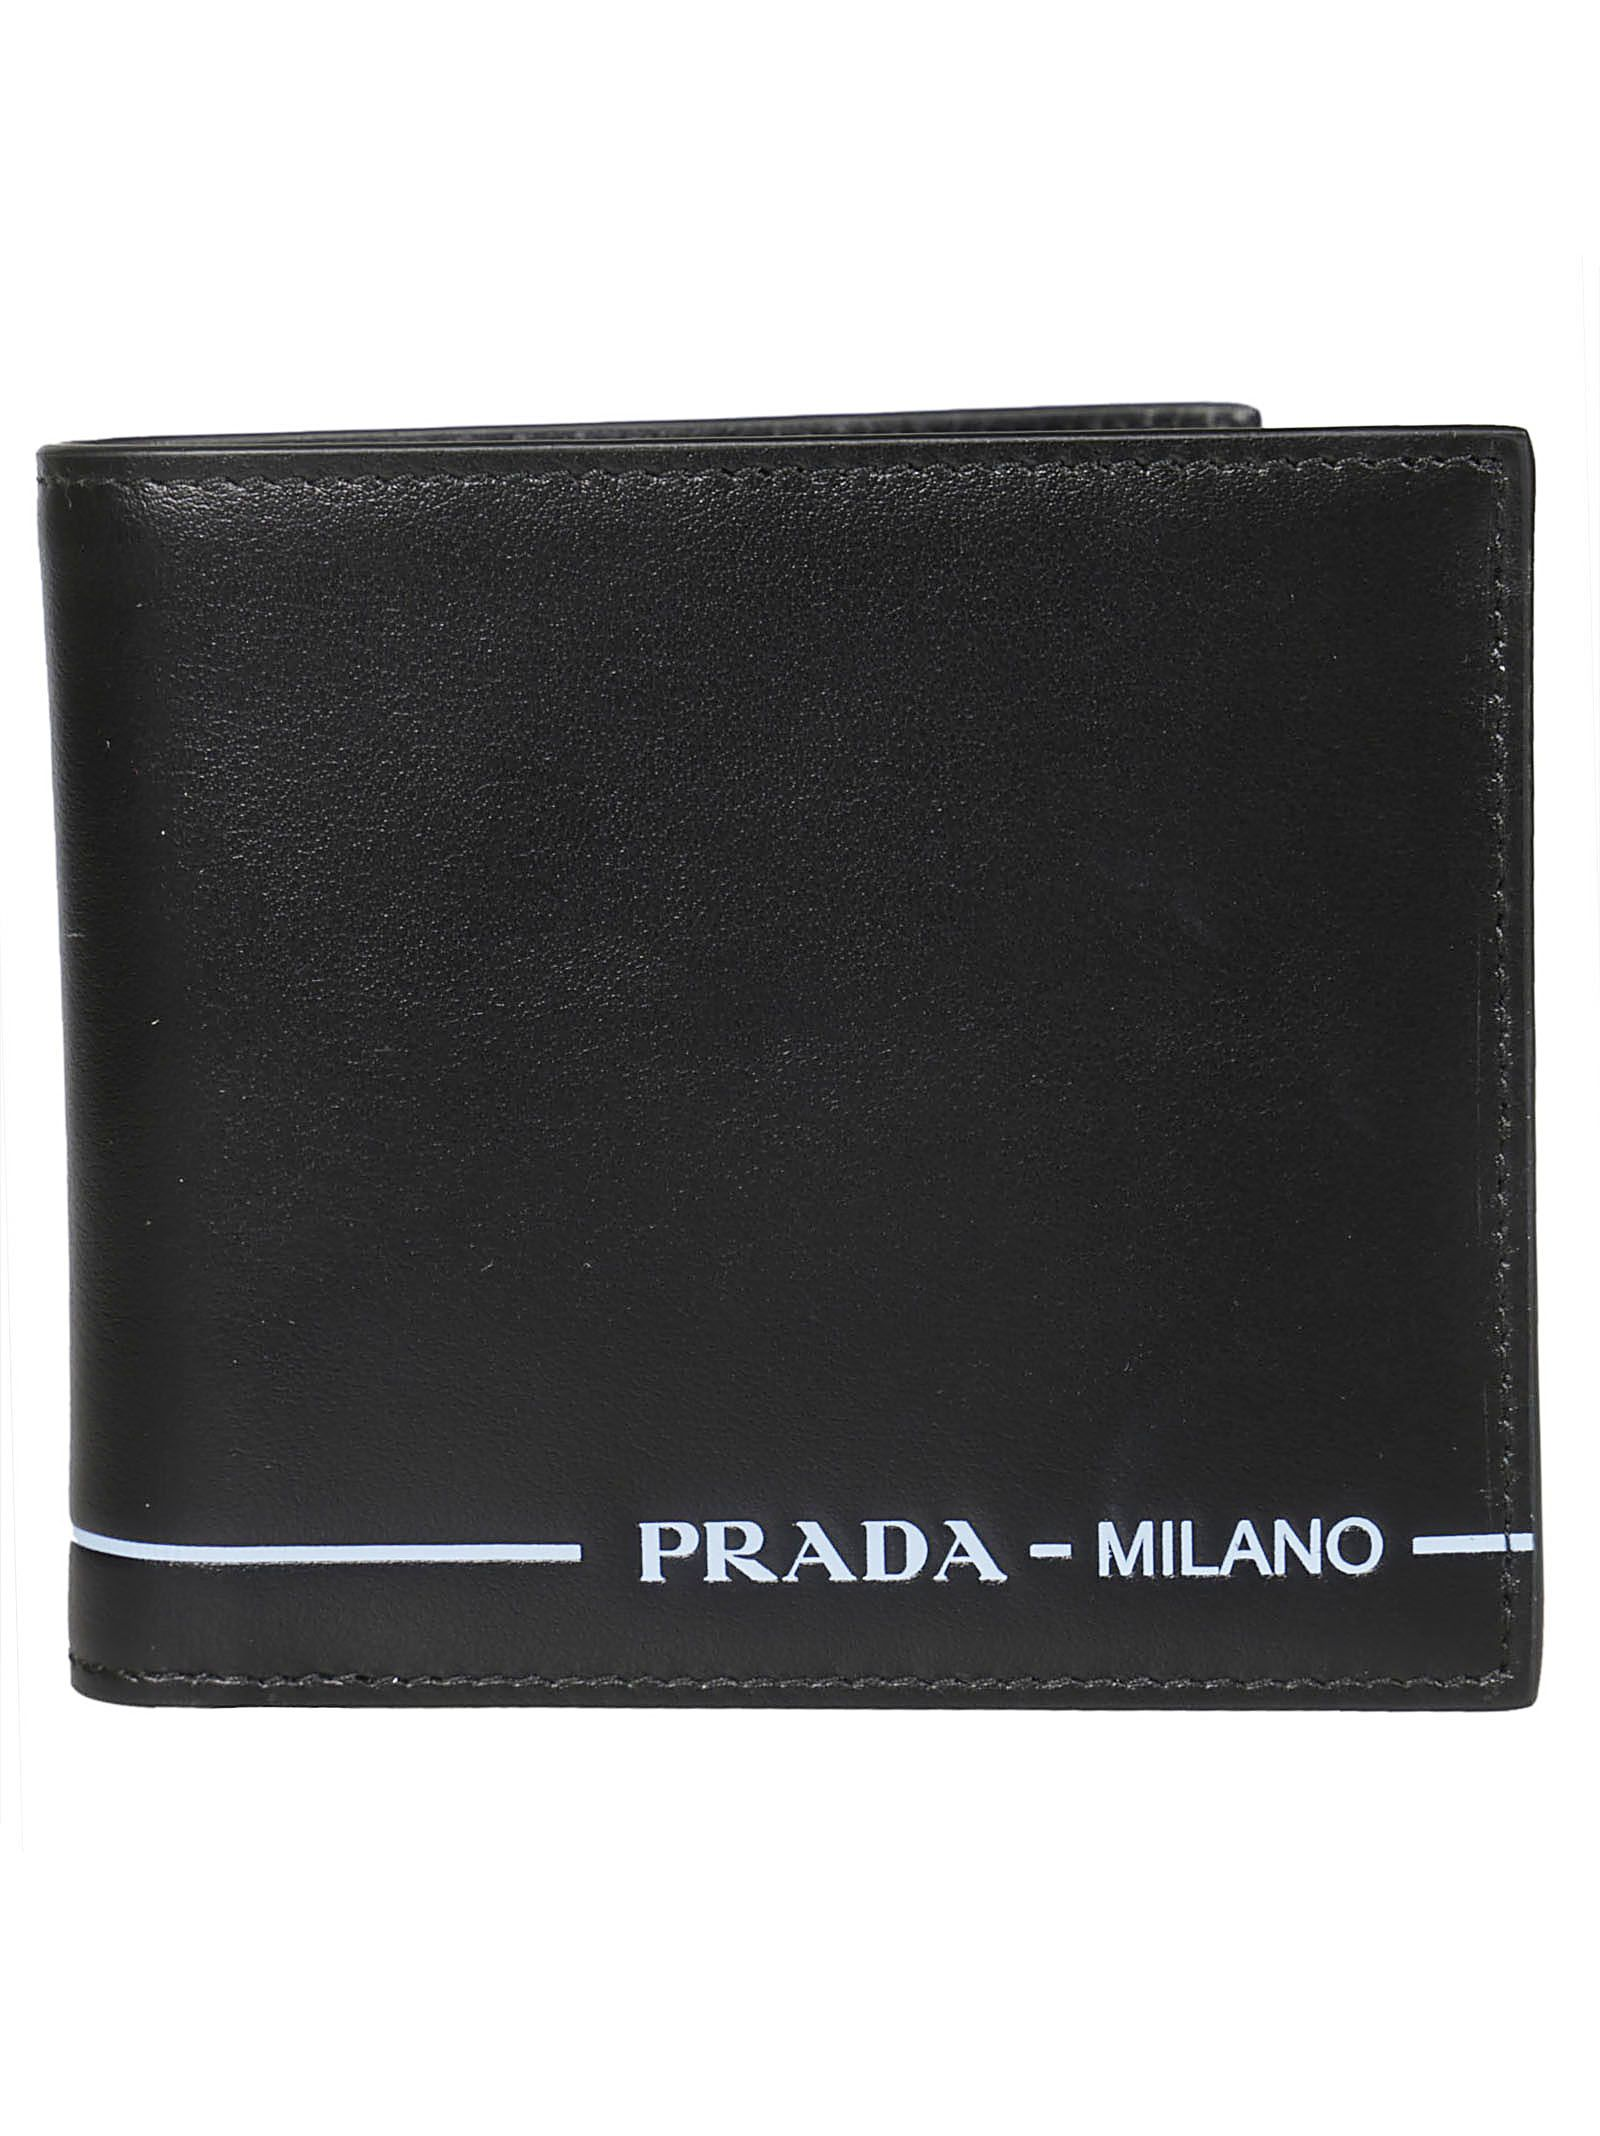 03f9229e6791 Prada Prada Logo Flap Wallet - Black - 10855831